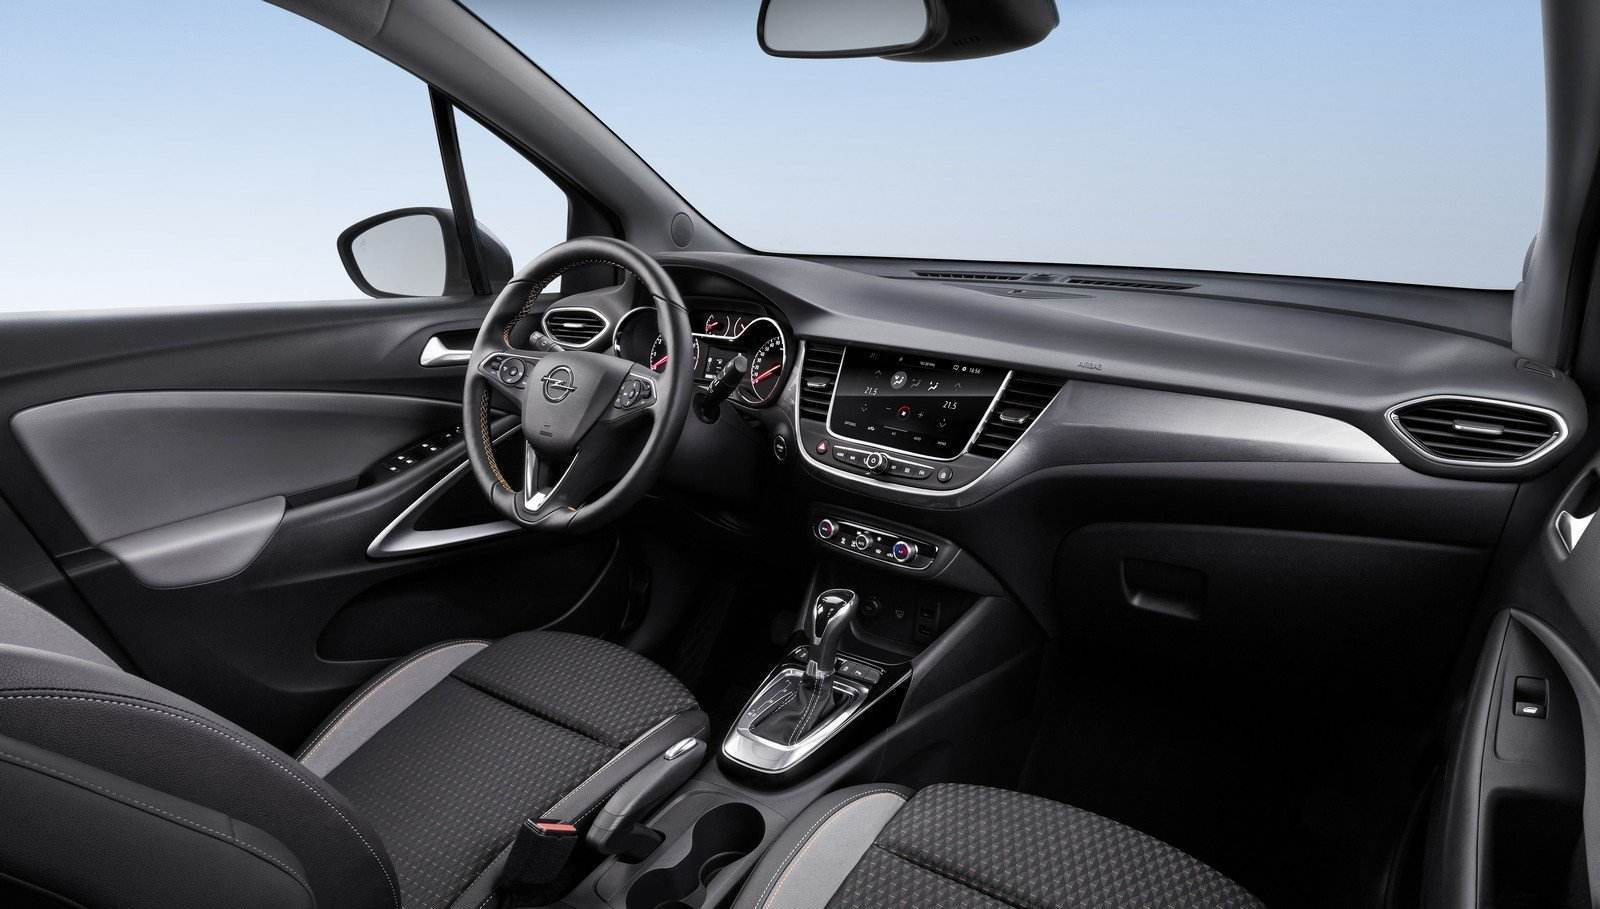 The Opel Crossland X